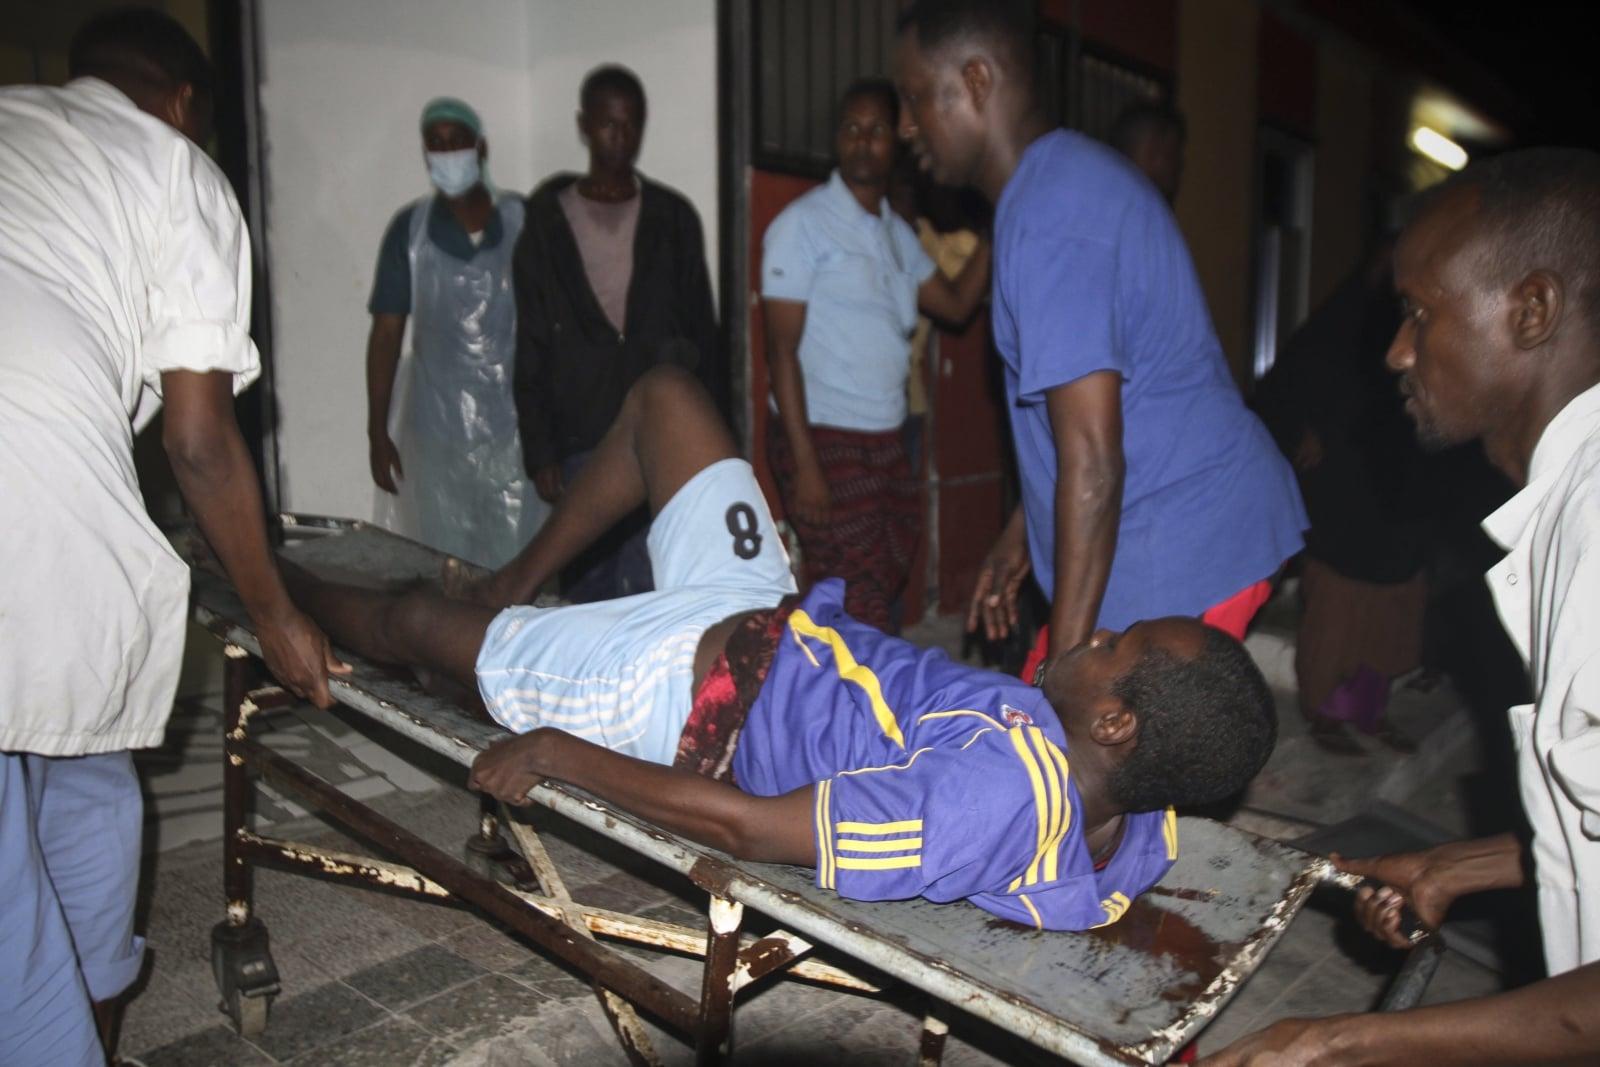 Samochód-bomba w Somalii fot. EPA/SAID YUSUF WARSAME